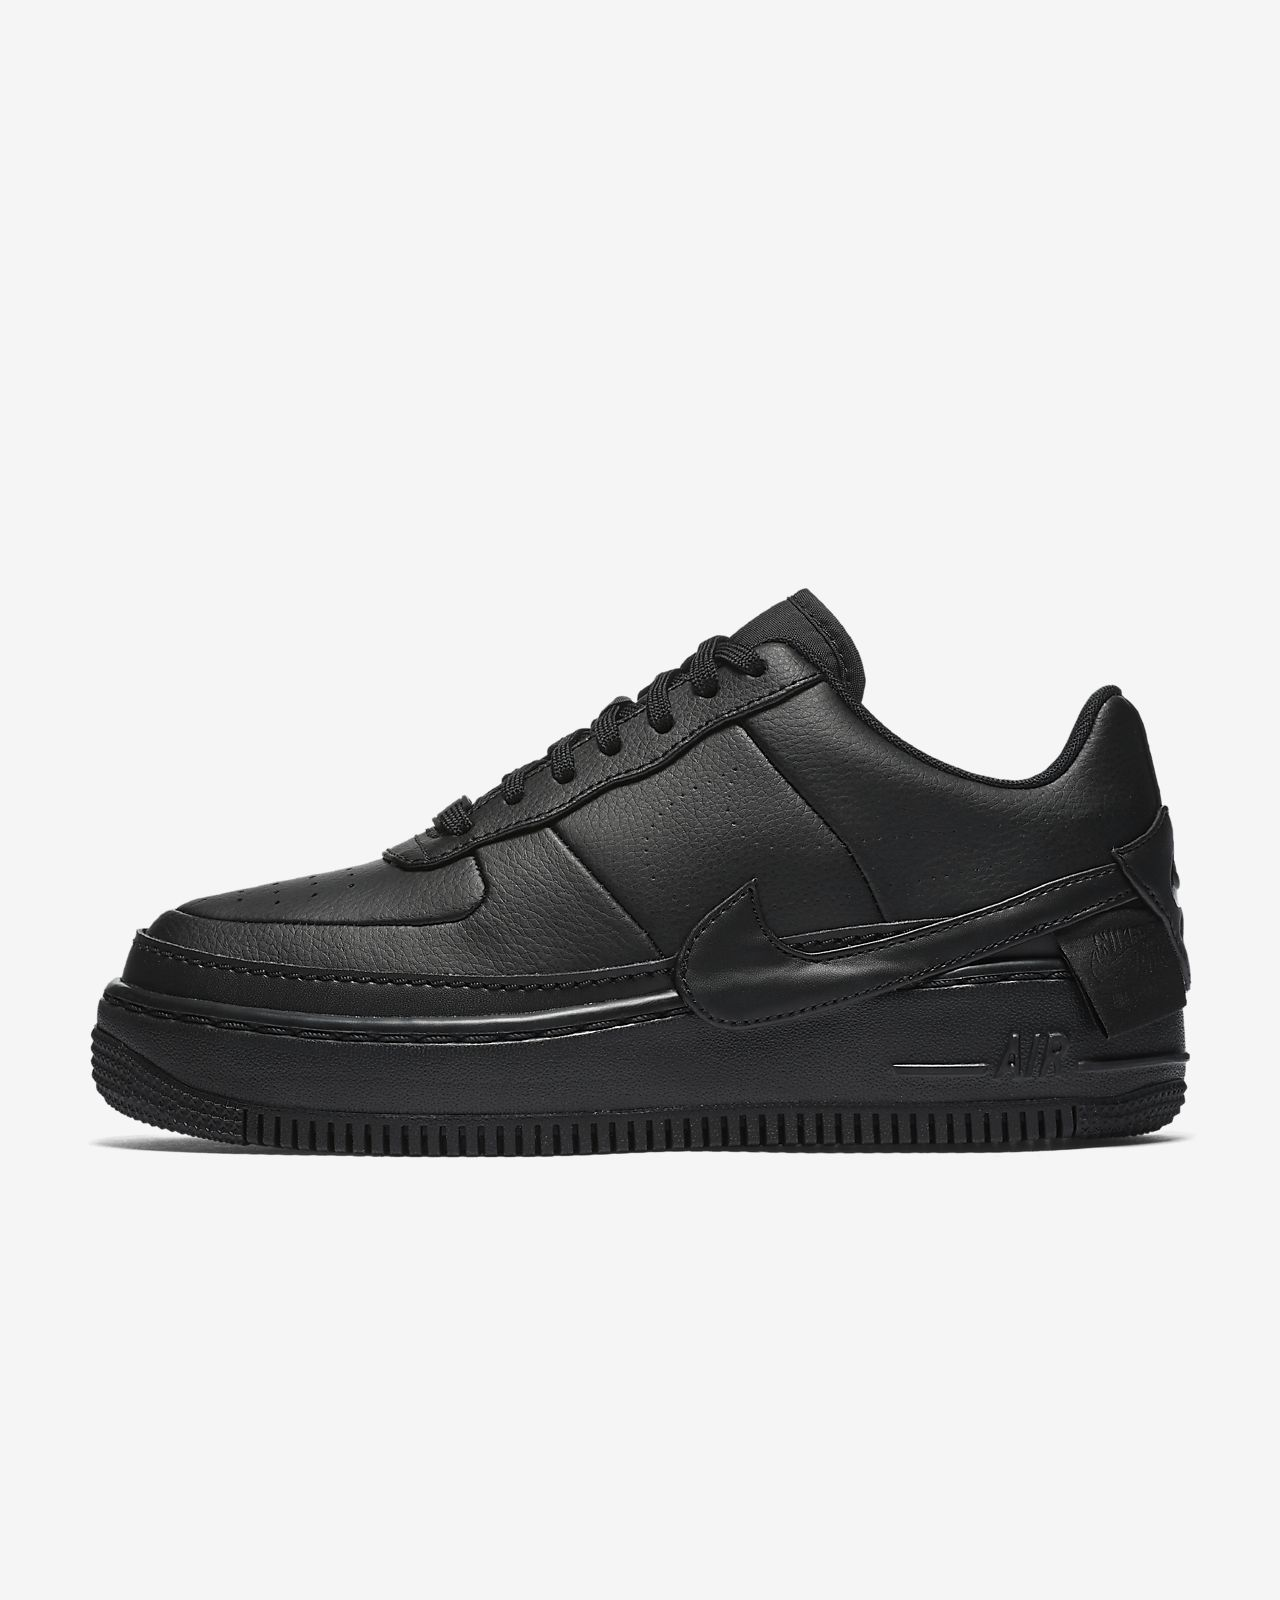 Chaussure Fr Femme Force Pour Nike Xx Air 1 Jester Scx7OvwSrq